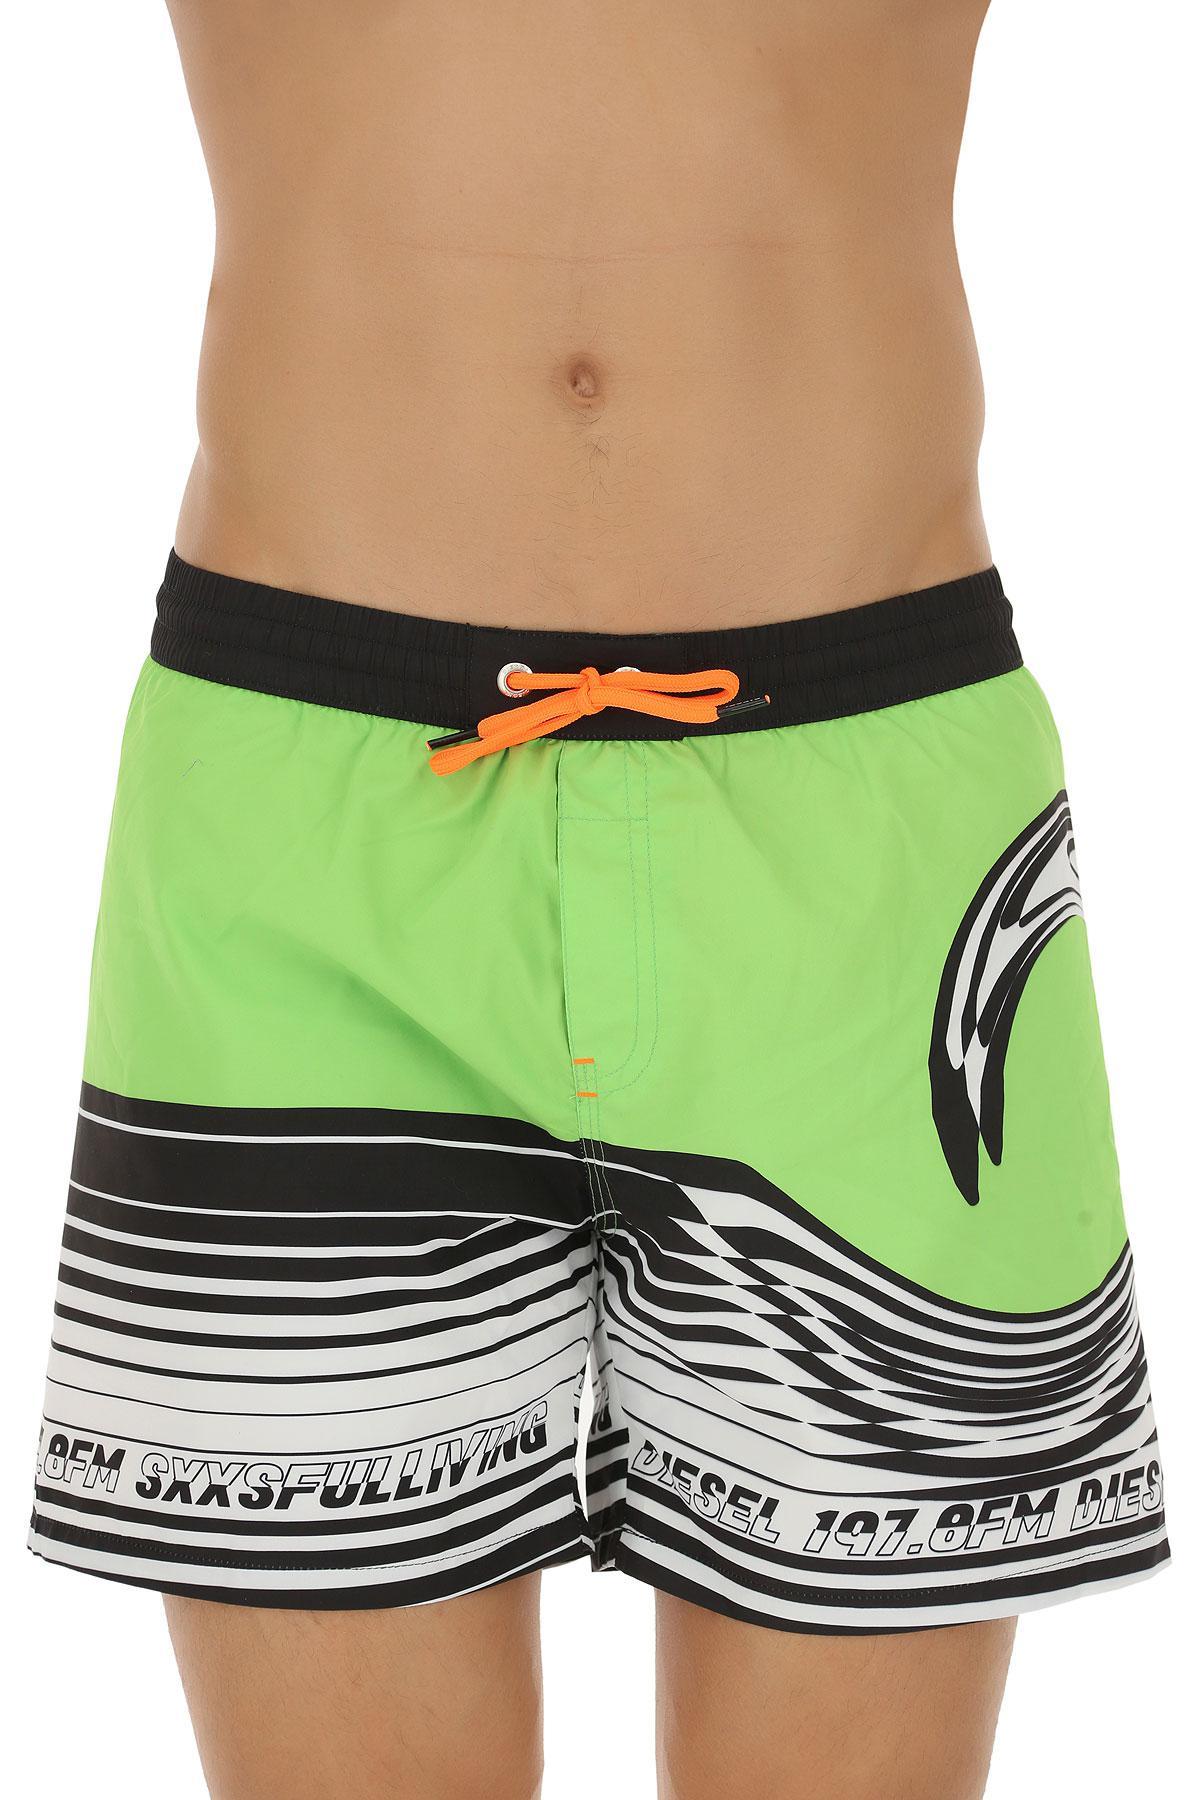 8592f5090e Lyst - DIESEL Swimwear For Men in Green for Men - Save 28%